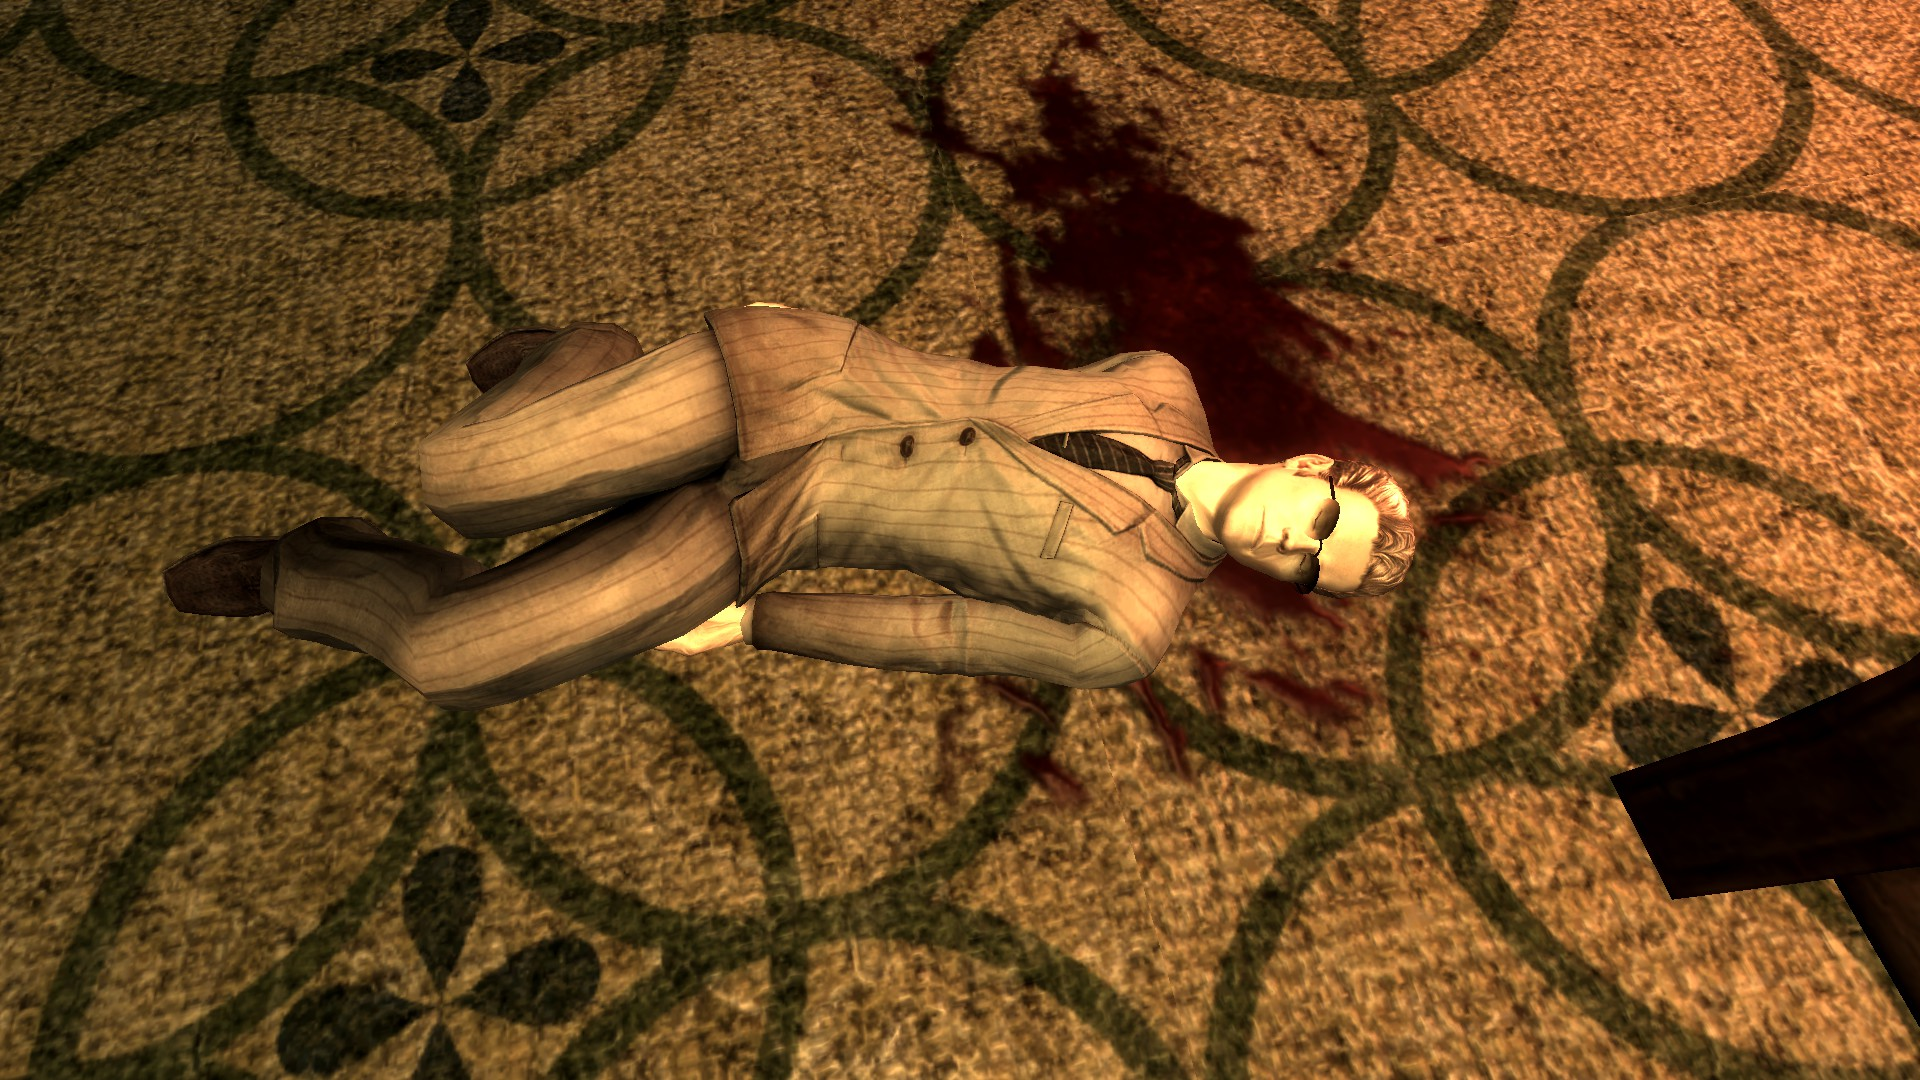 Звонок — Прохождение Fallout New Vegas - Bethplanet ru